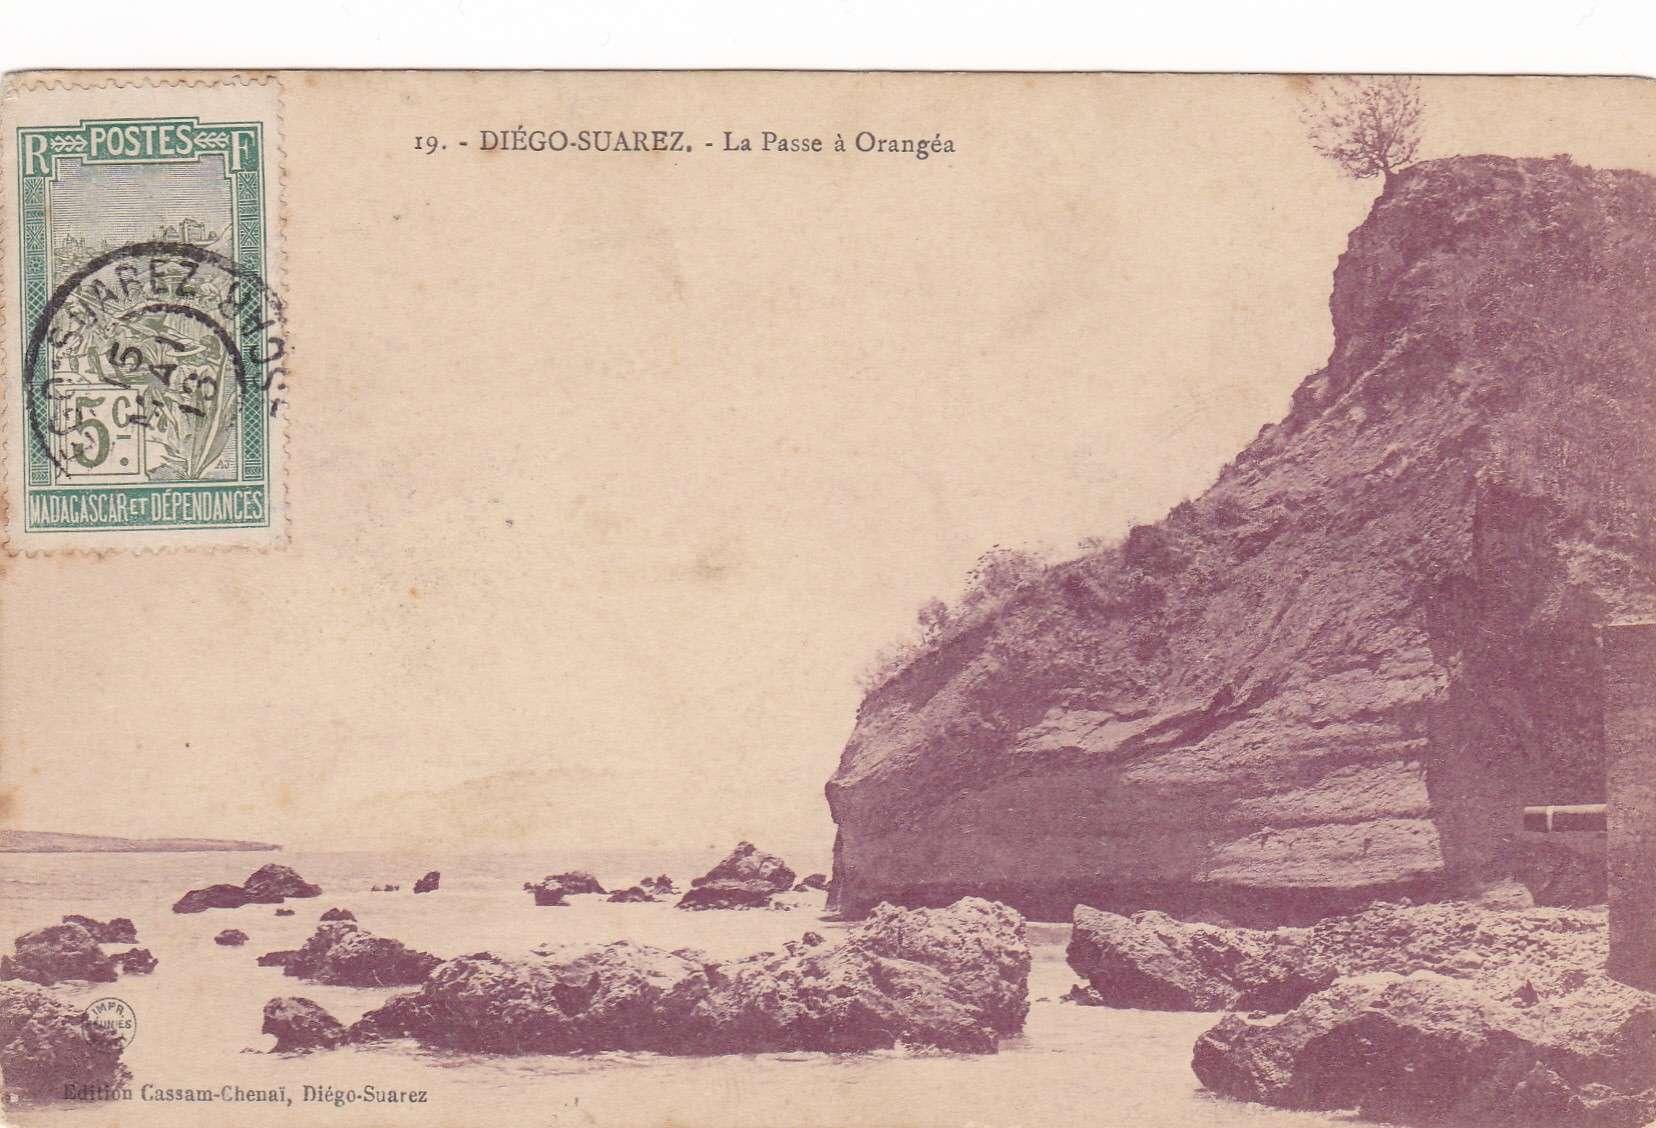 [Campagne] PLAGE DE RAMENA - Page 2 Img23